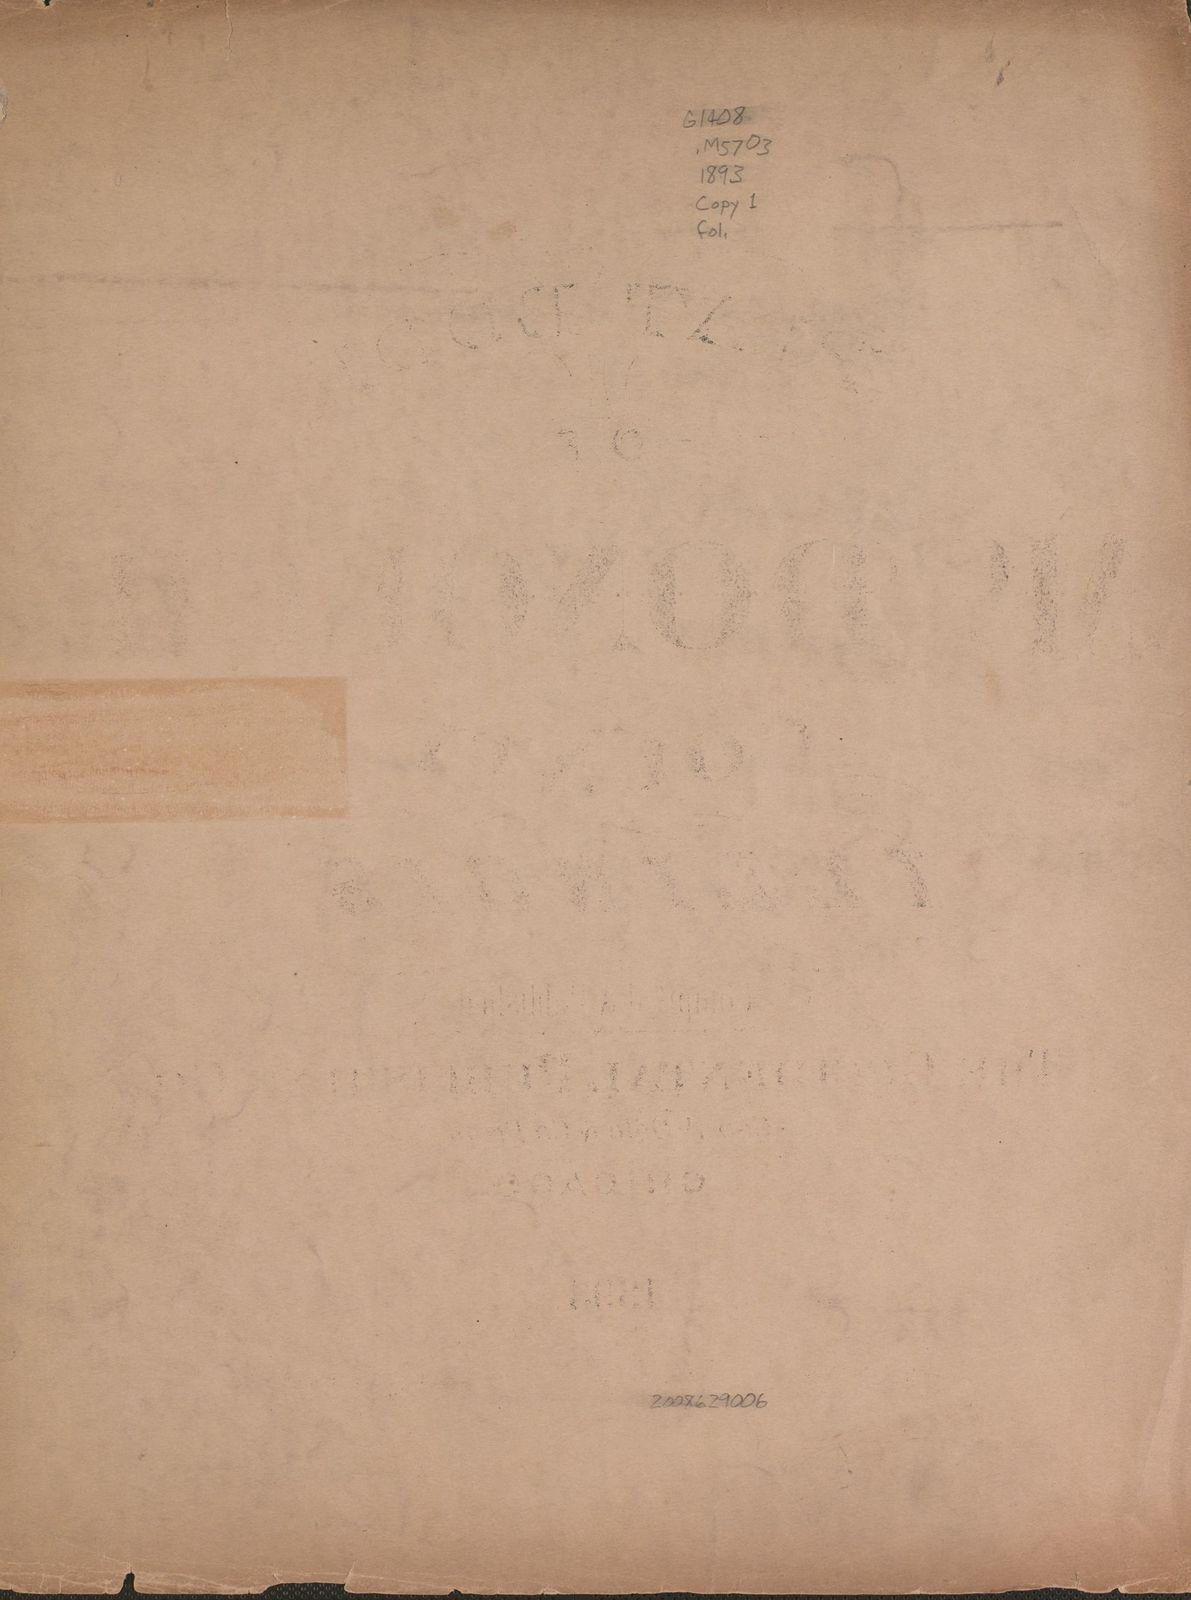 Plat book of McDonough County, Illinois /